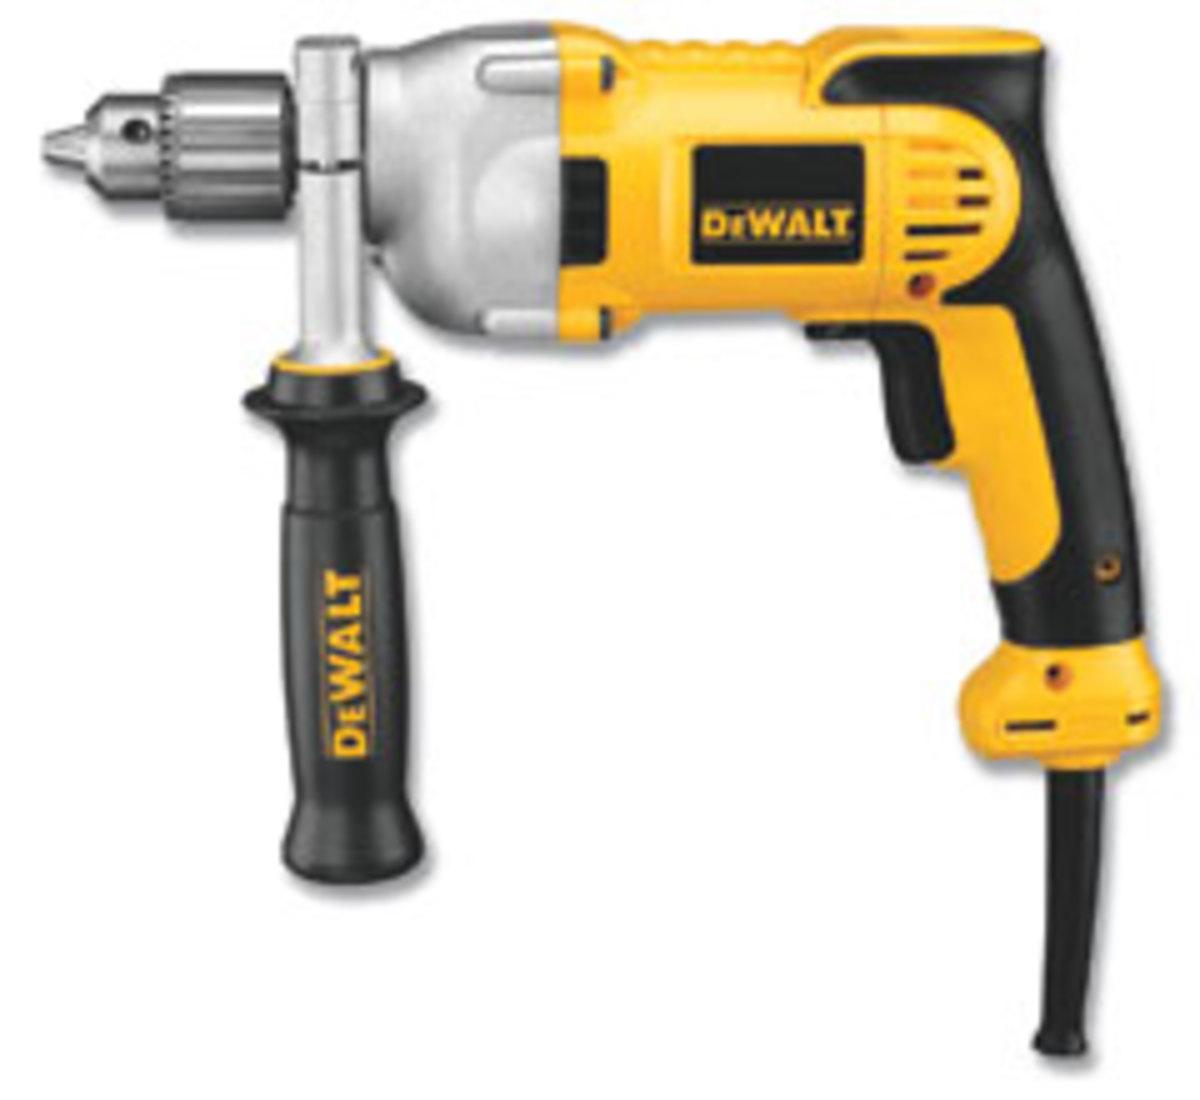 "DeWalt's 1/2"" corded drill, model DWD210G, with a pistol grip."